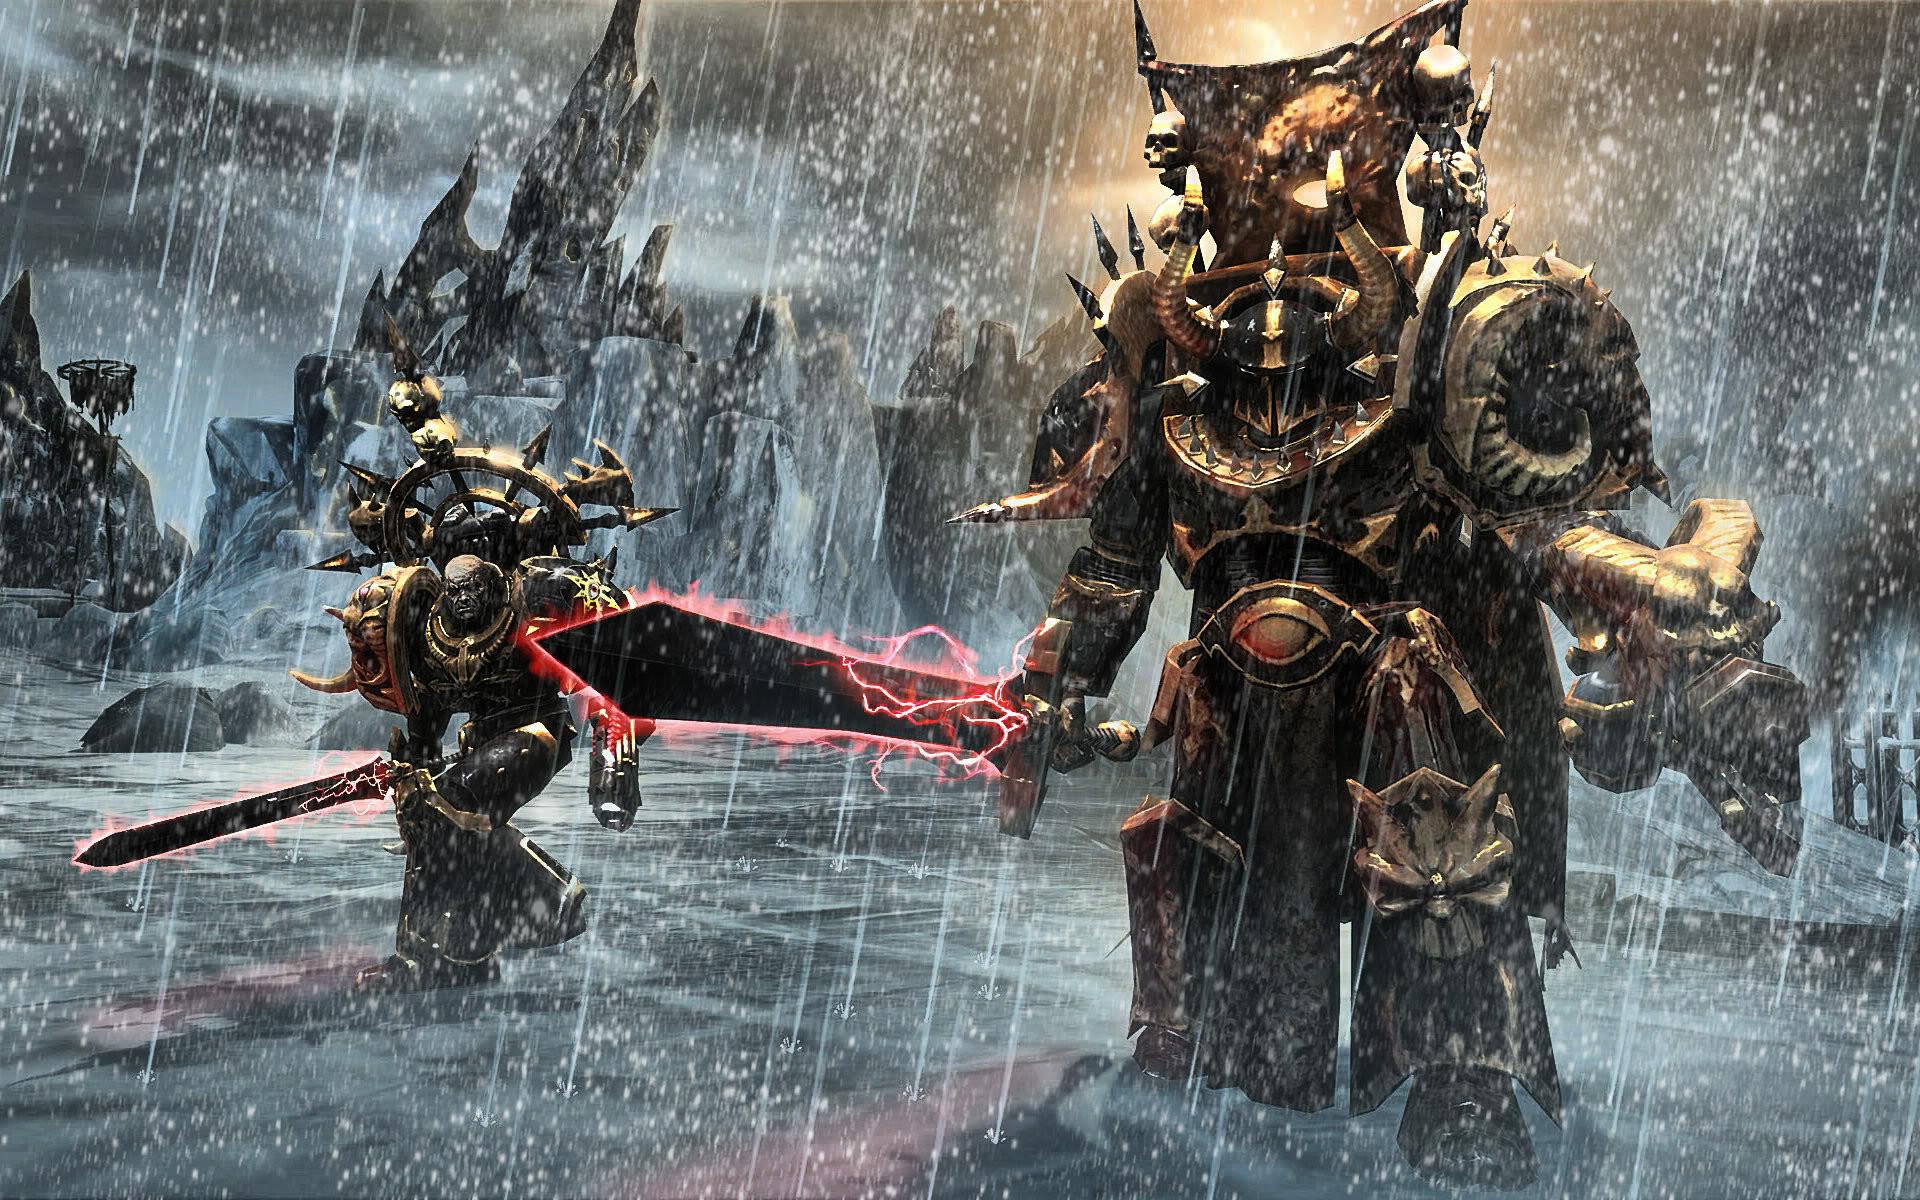 Warhammer 40k Chaos Wallpapers, wallpaper, Warhammer 40k Chaos .